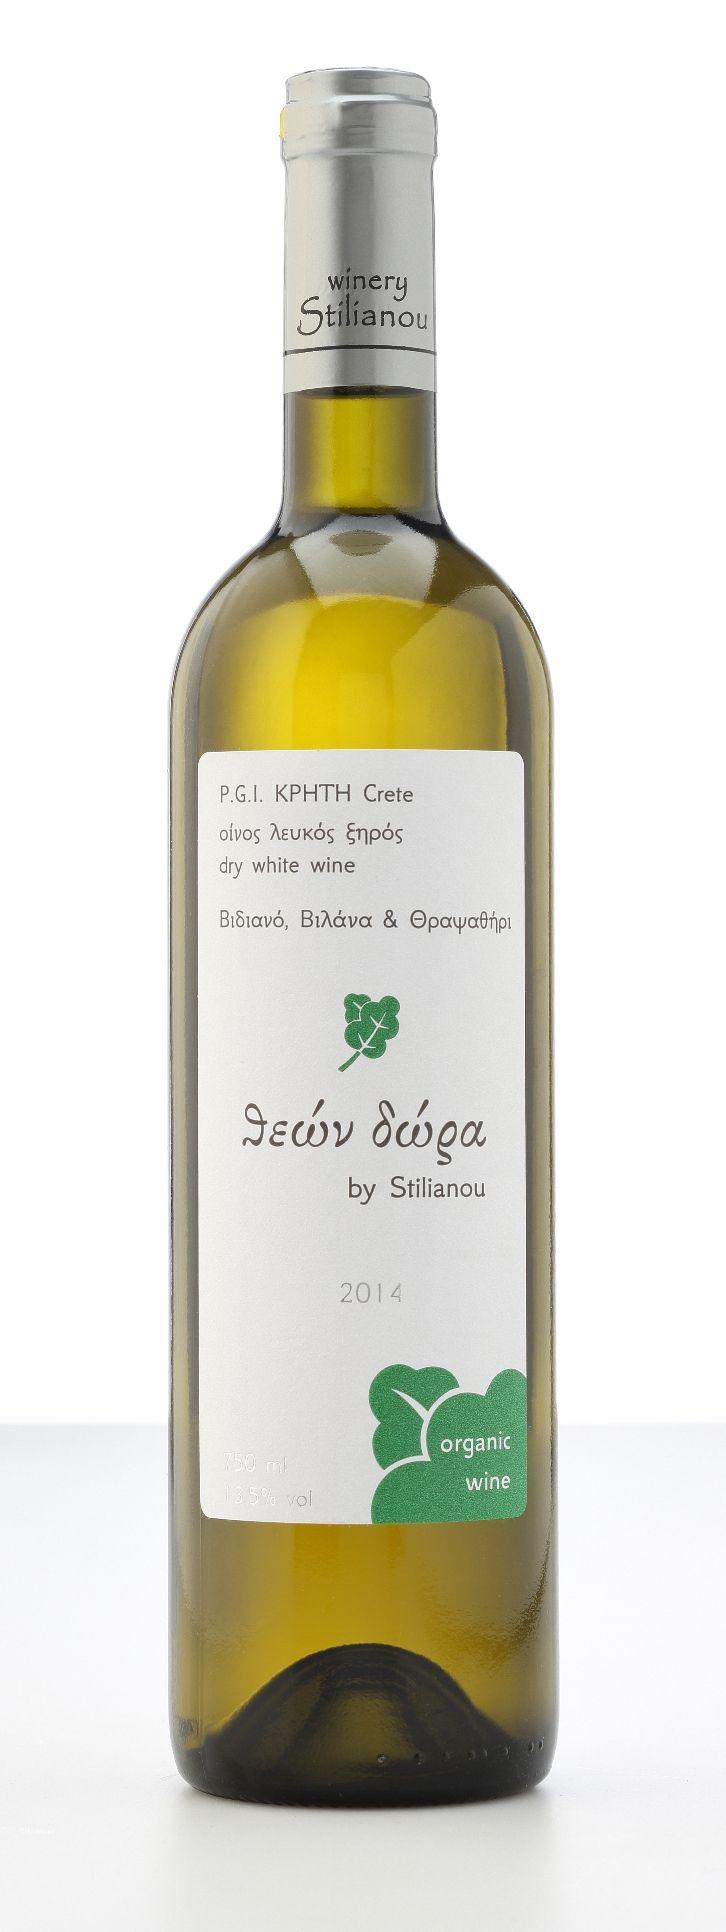 Theon Dora White Organic Wine Stilianou Winery